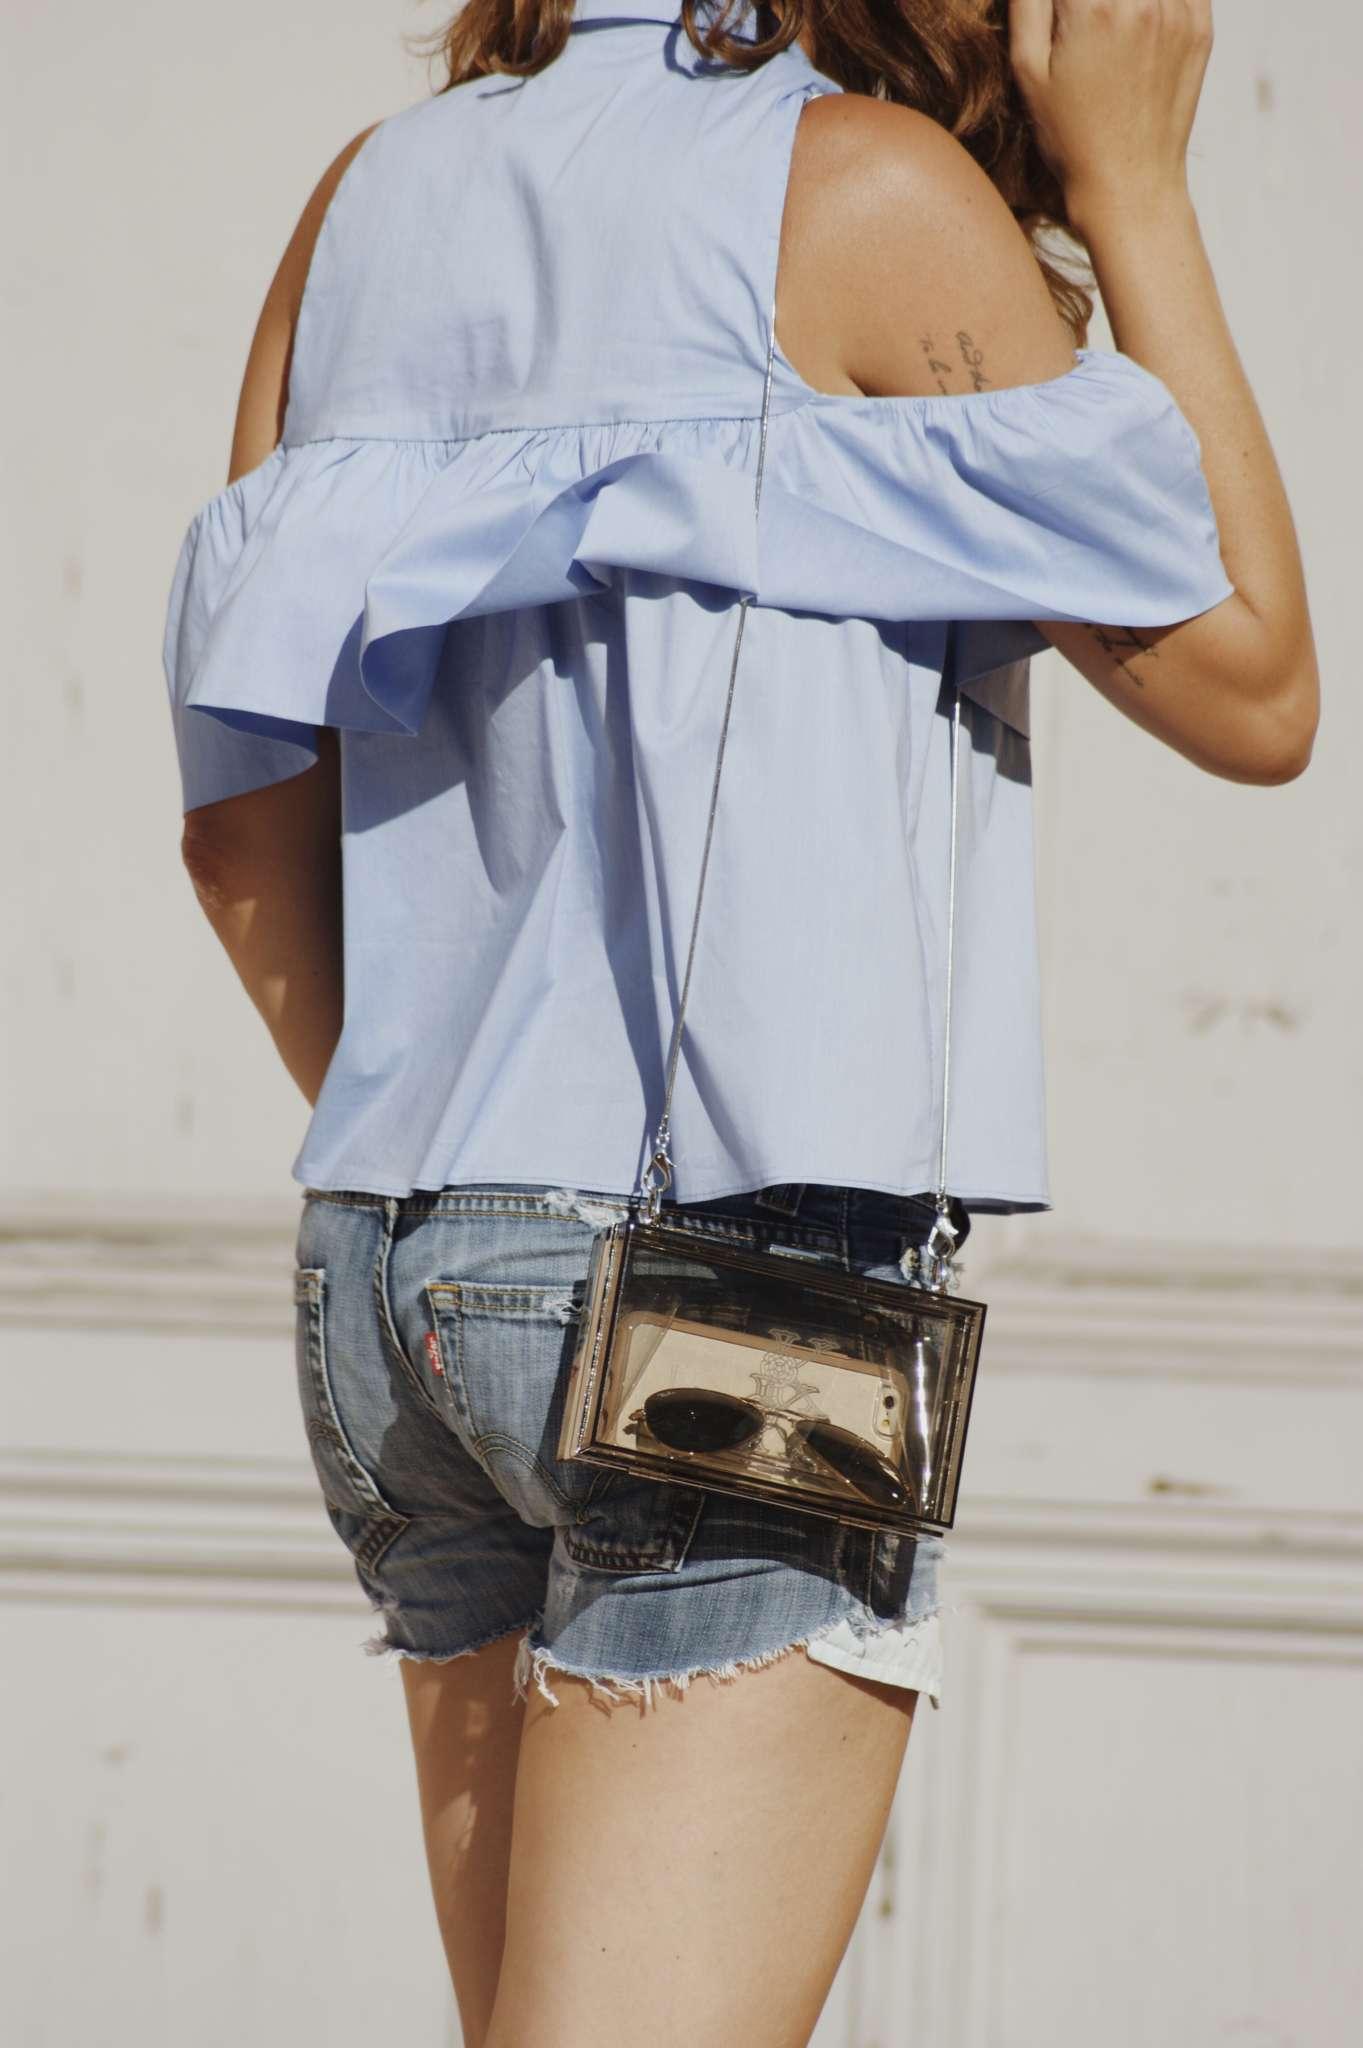 acrylic-bag-clutch-Isabel-Marant-Etoile-Jaeryn-sandals-kanjana-designs-loavies-rayban